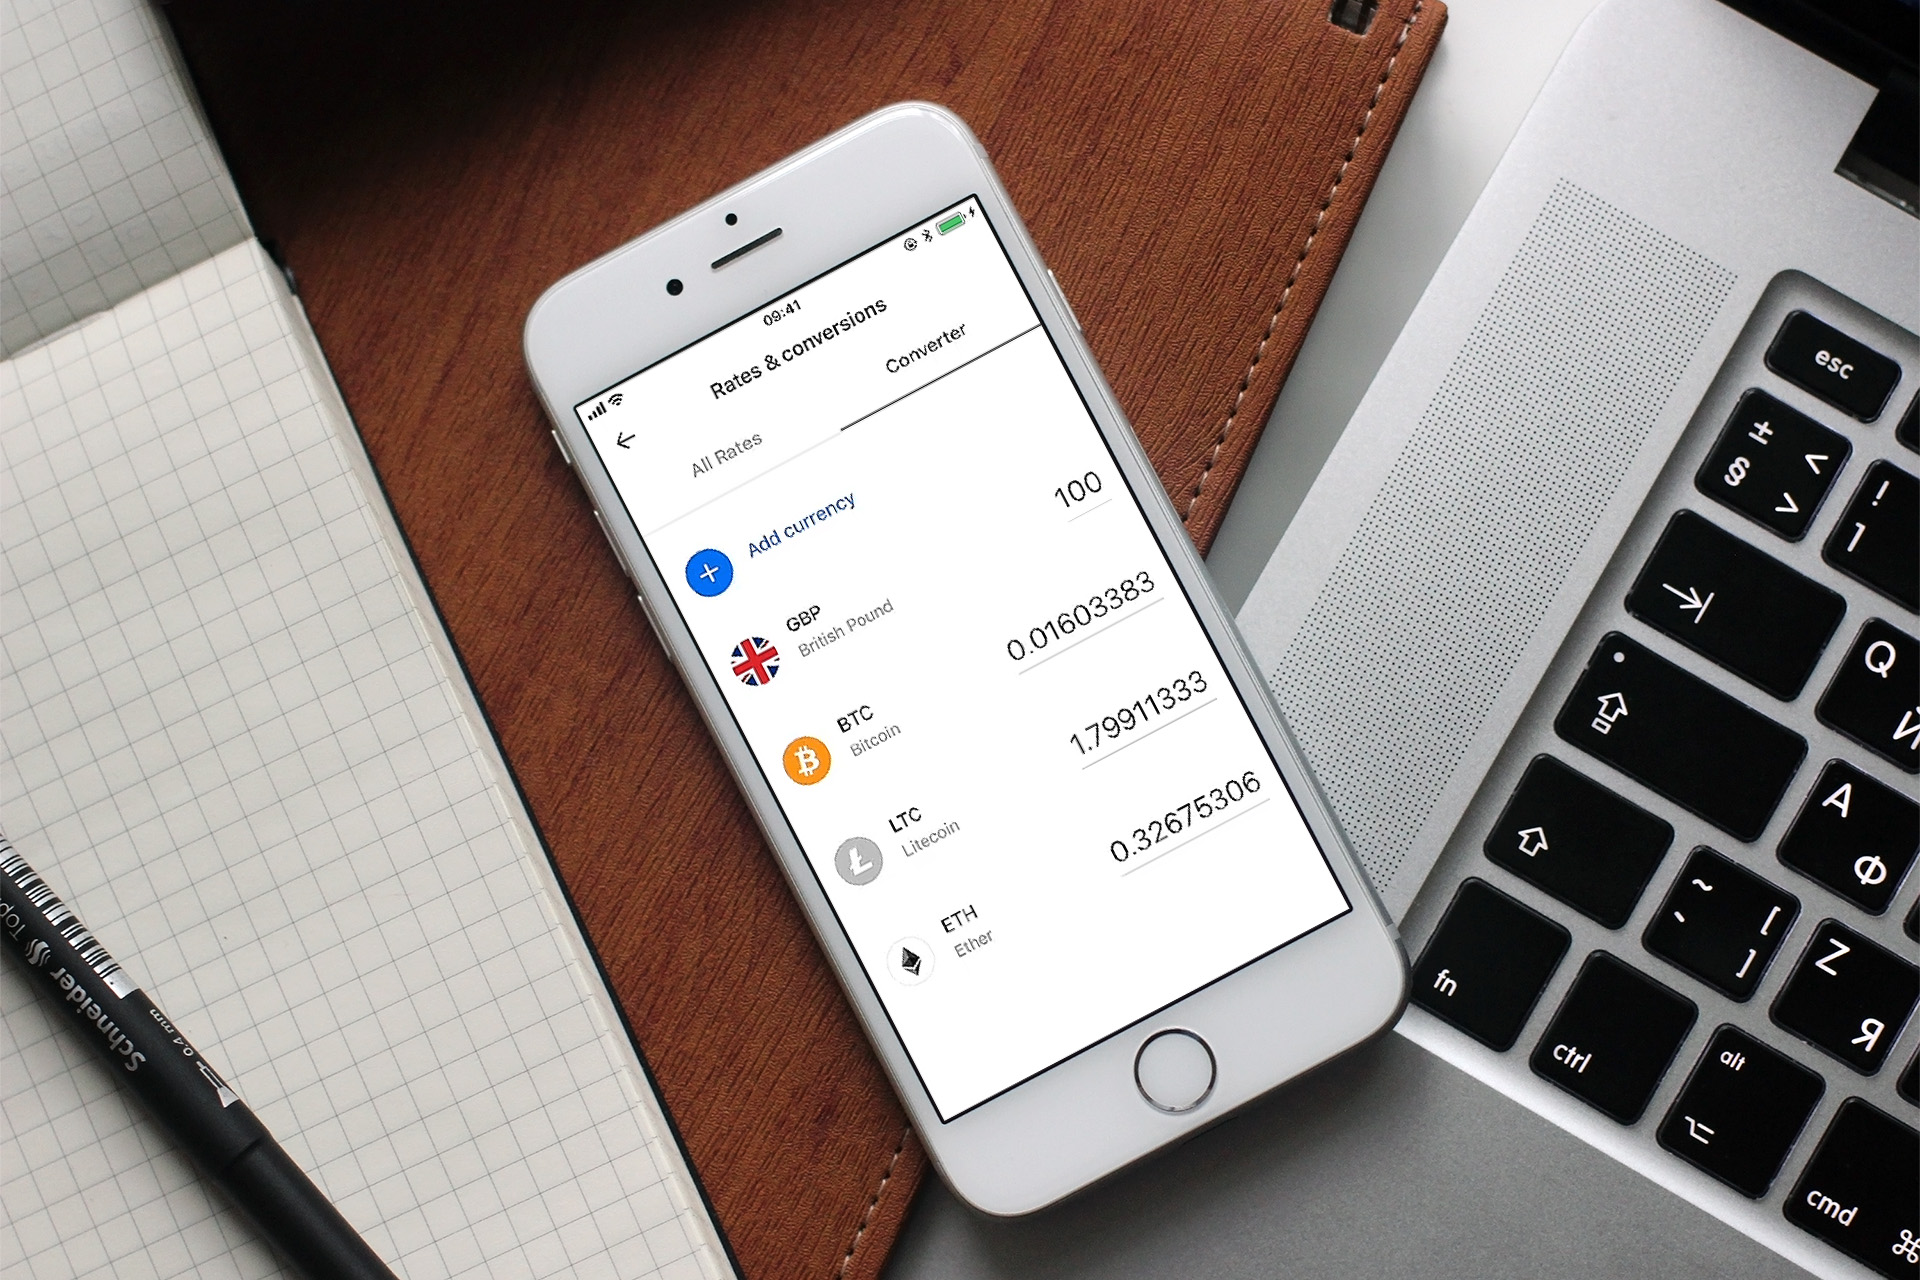 blockchain-criptomonedas-aplicaciones-banca-revolut